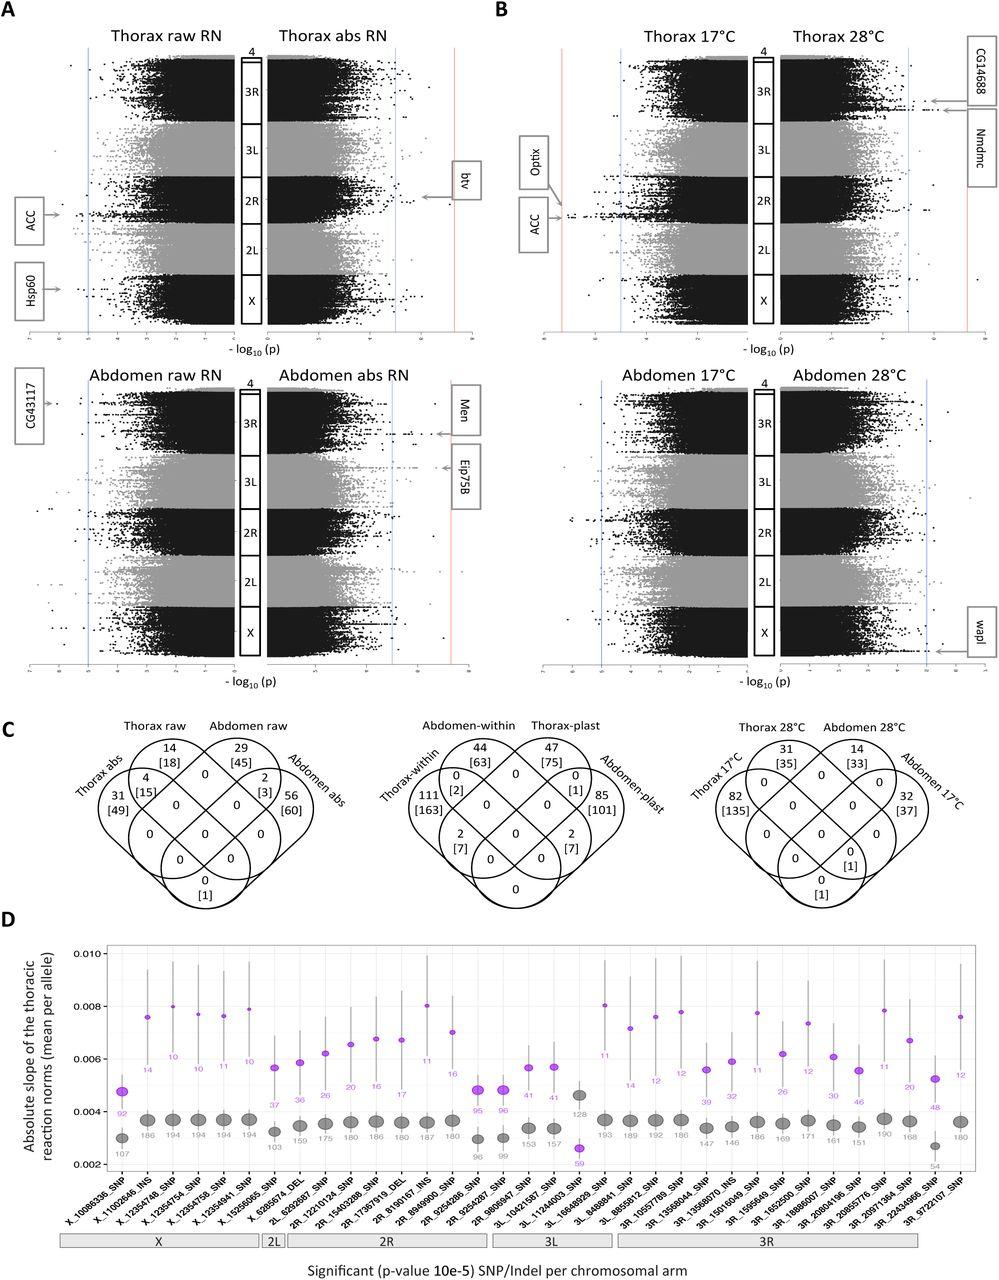 Genetic basis of thermal plasticity variation in Drosophila